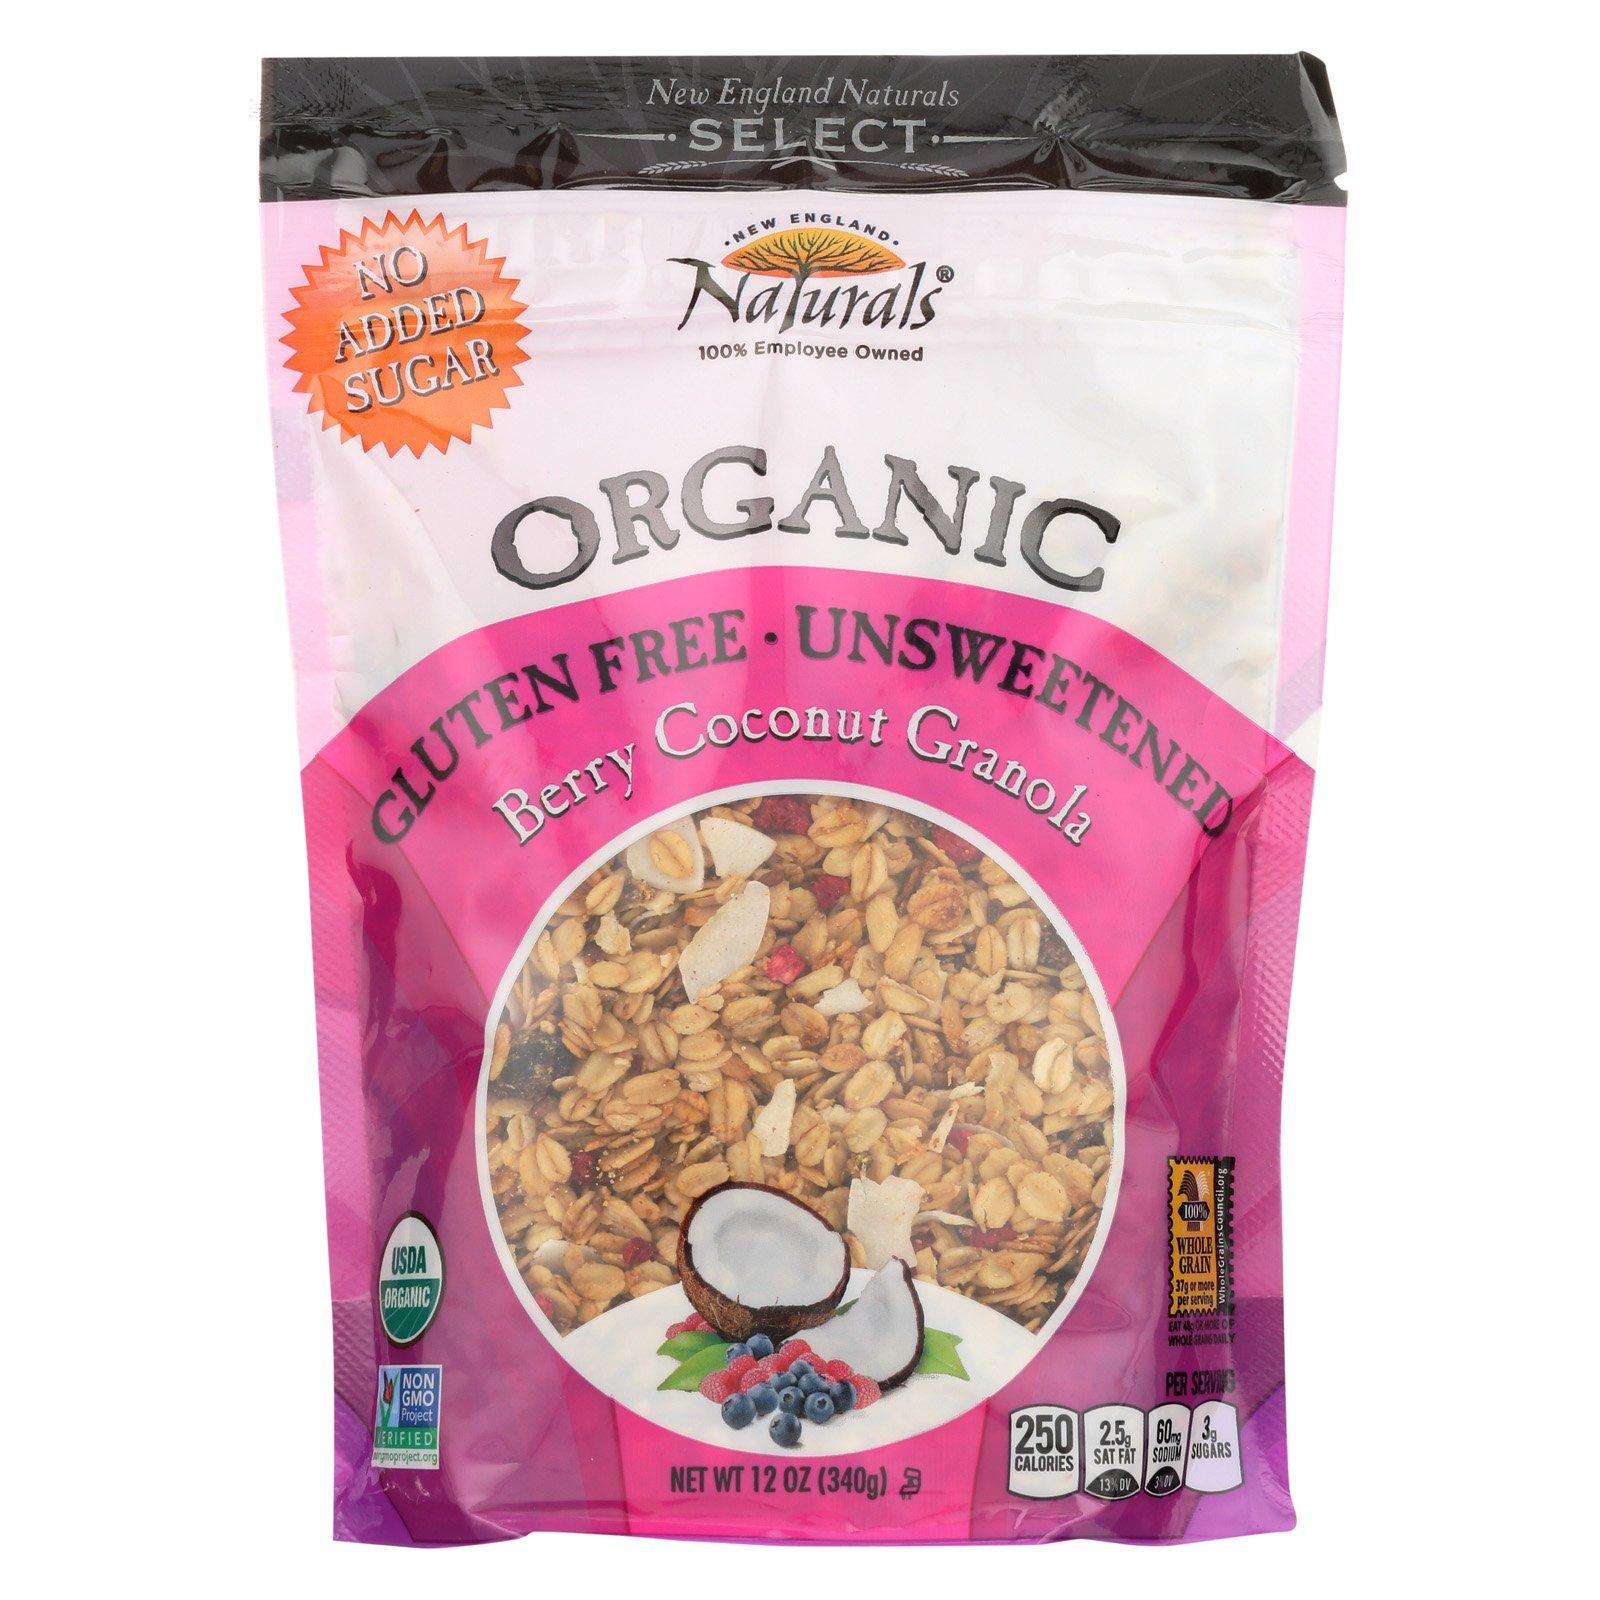 New England Naturals Organic Granola Select Berry - Coconut - Non GMO - Case of 6 - 12 Ounce